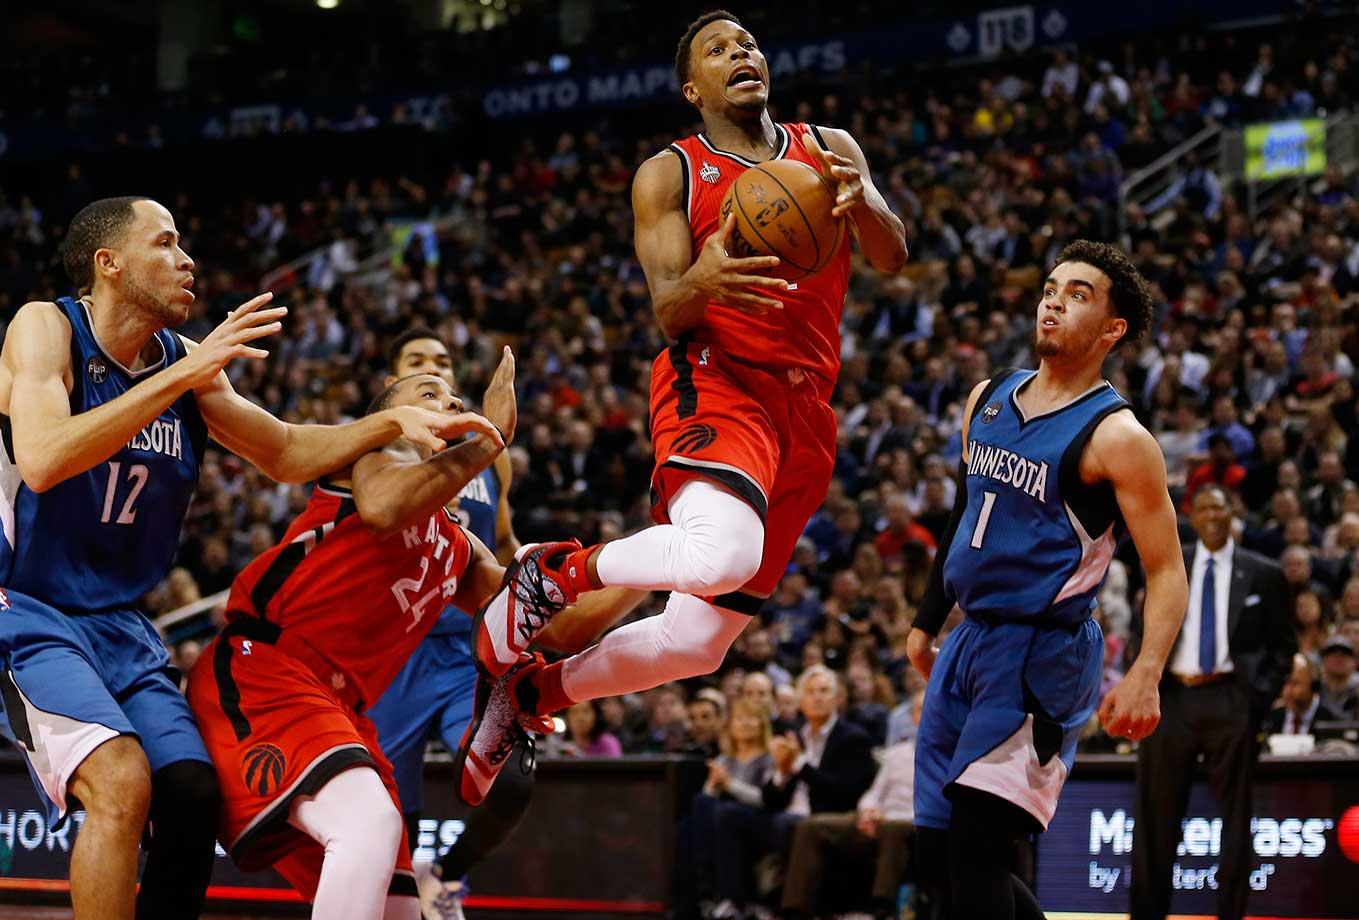 Toronto Raptors guard Kyle Lowry flies to the basket against the Minnesota Timberwolves.